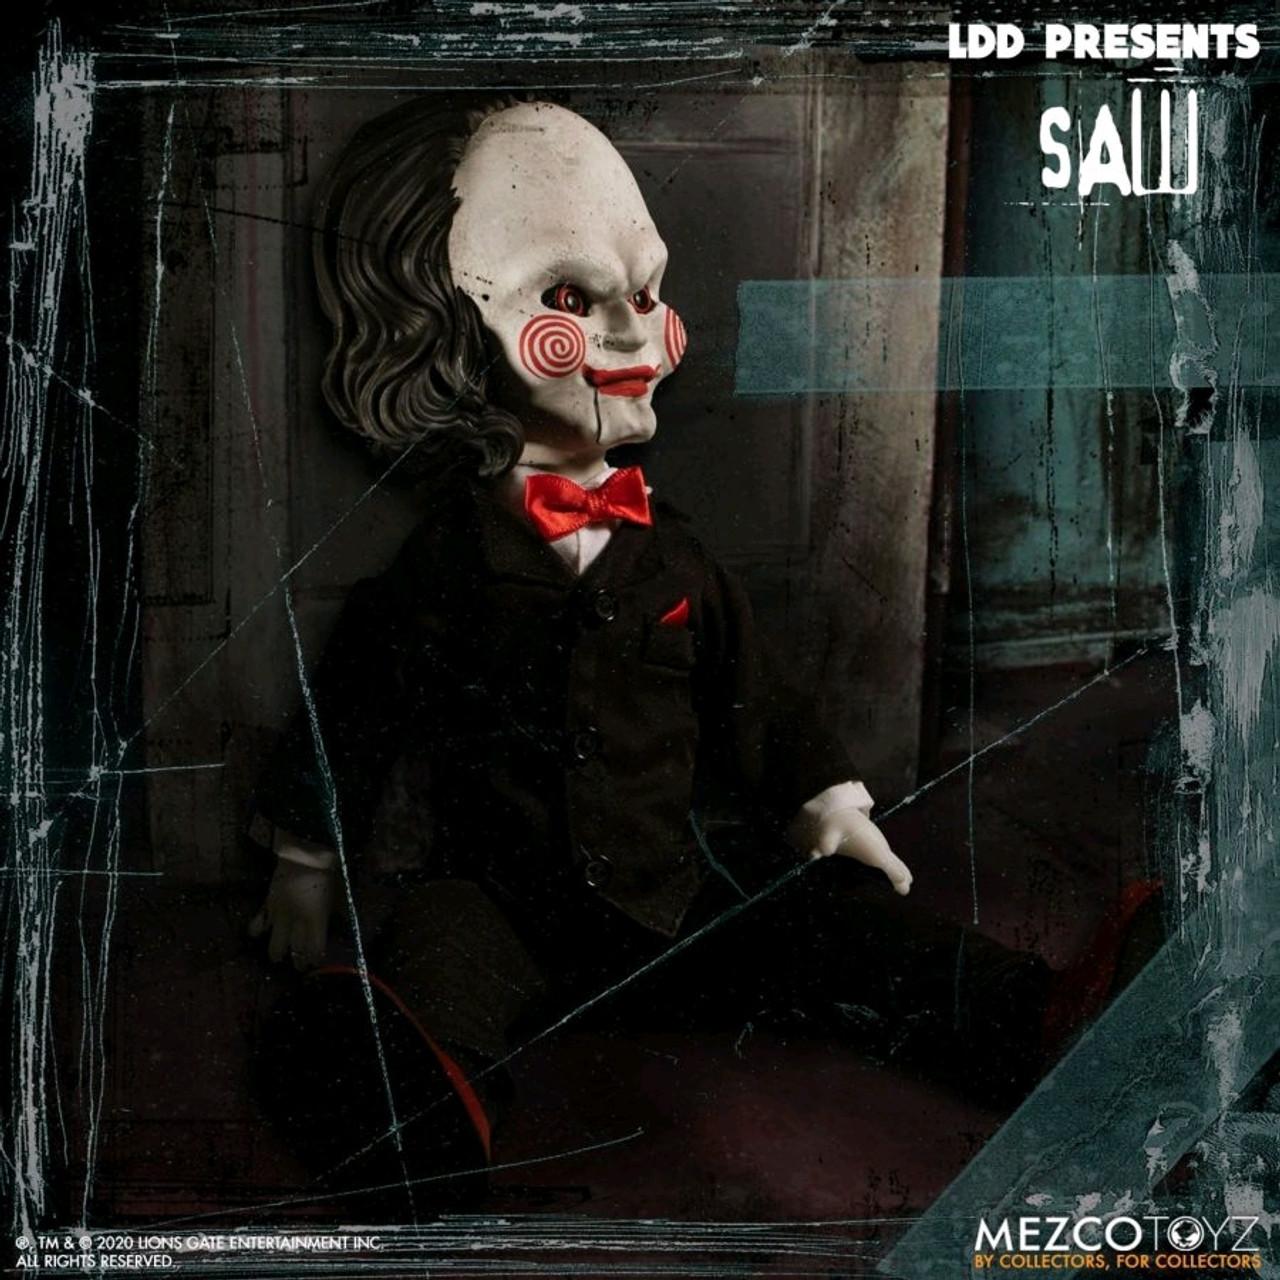 Living Dead Dolls - Saw Billy the Puppet-MEZ99620-MEZCO TOYZ